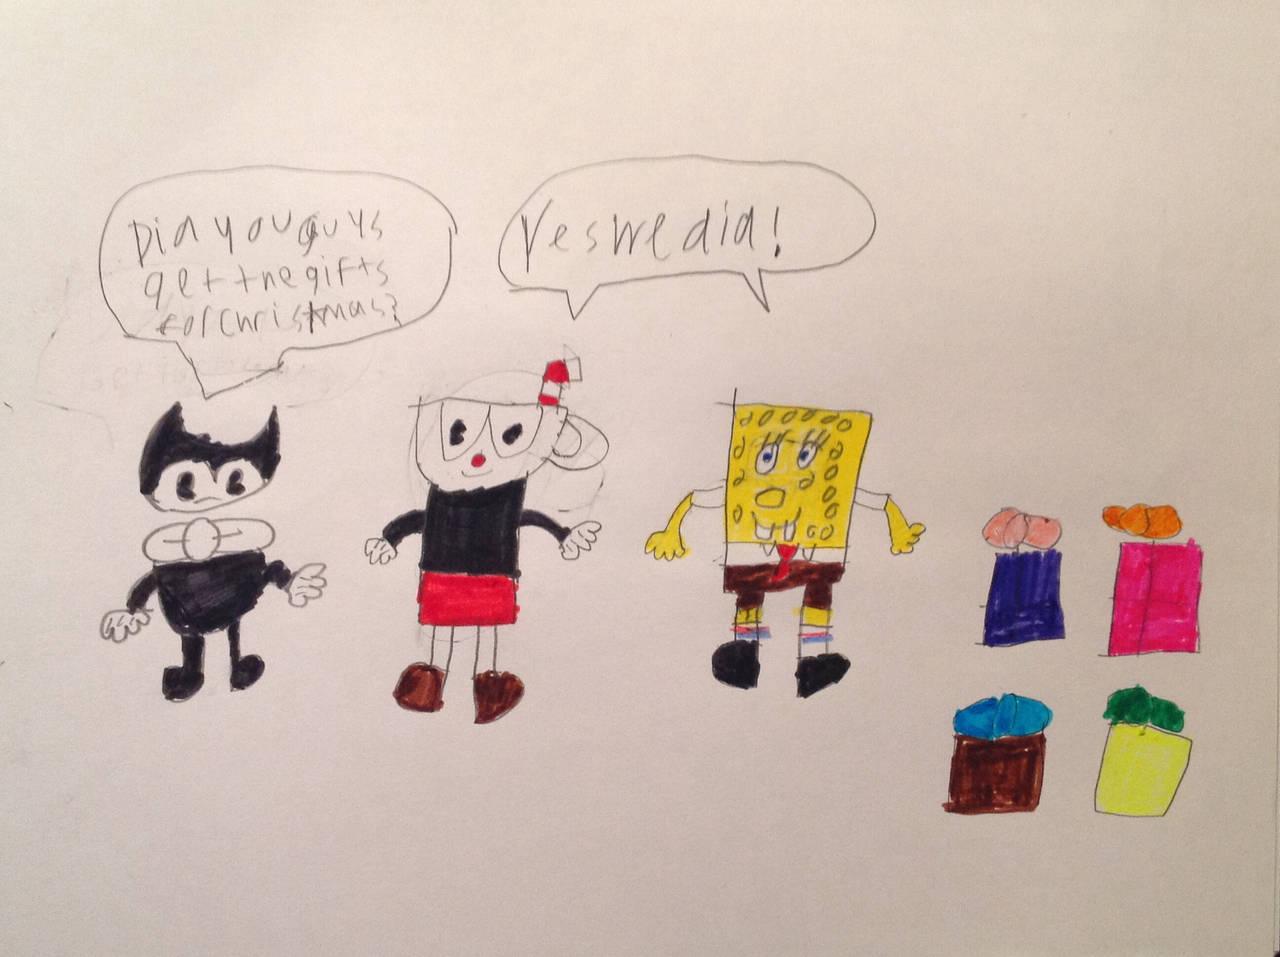 Spongebob Meet Bendy Deviantart: Bendy Asking Spongebob And Cuphead About Presents By